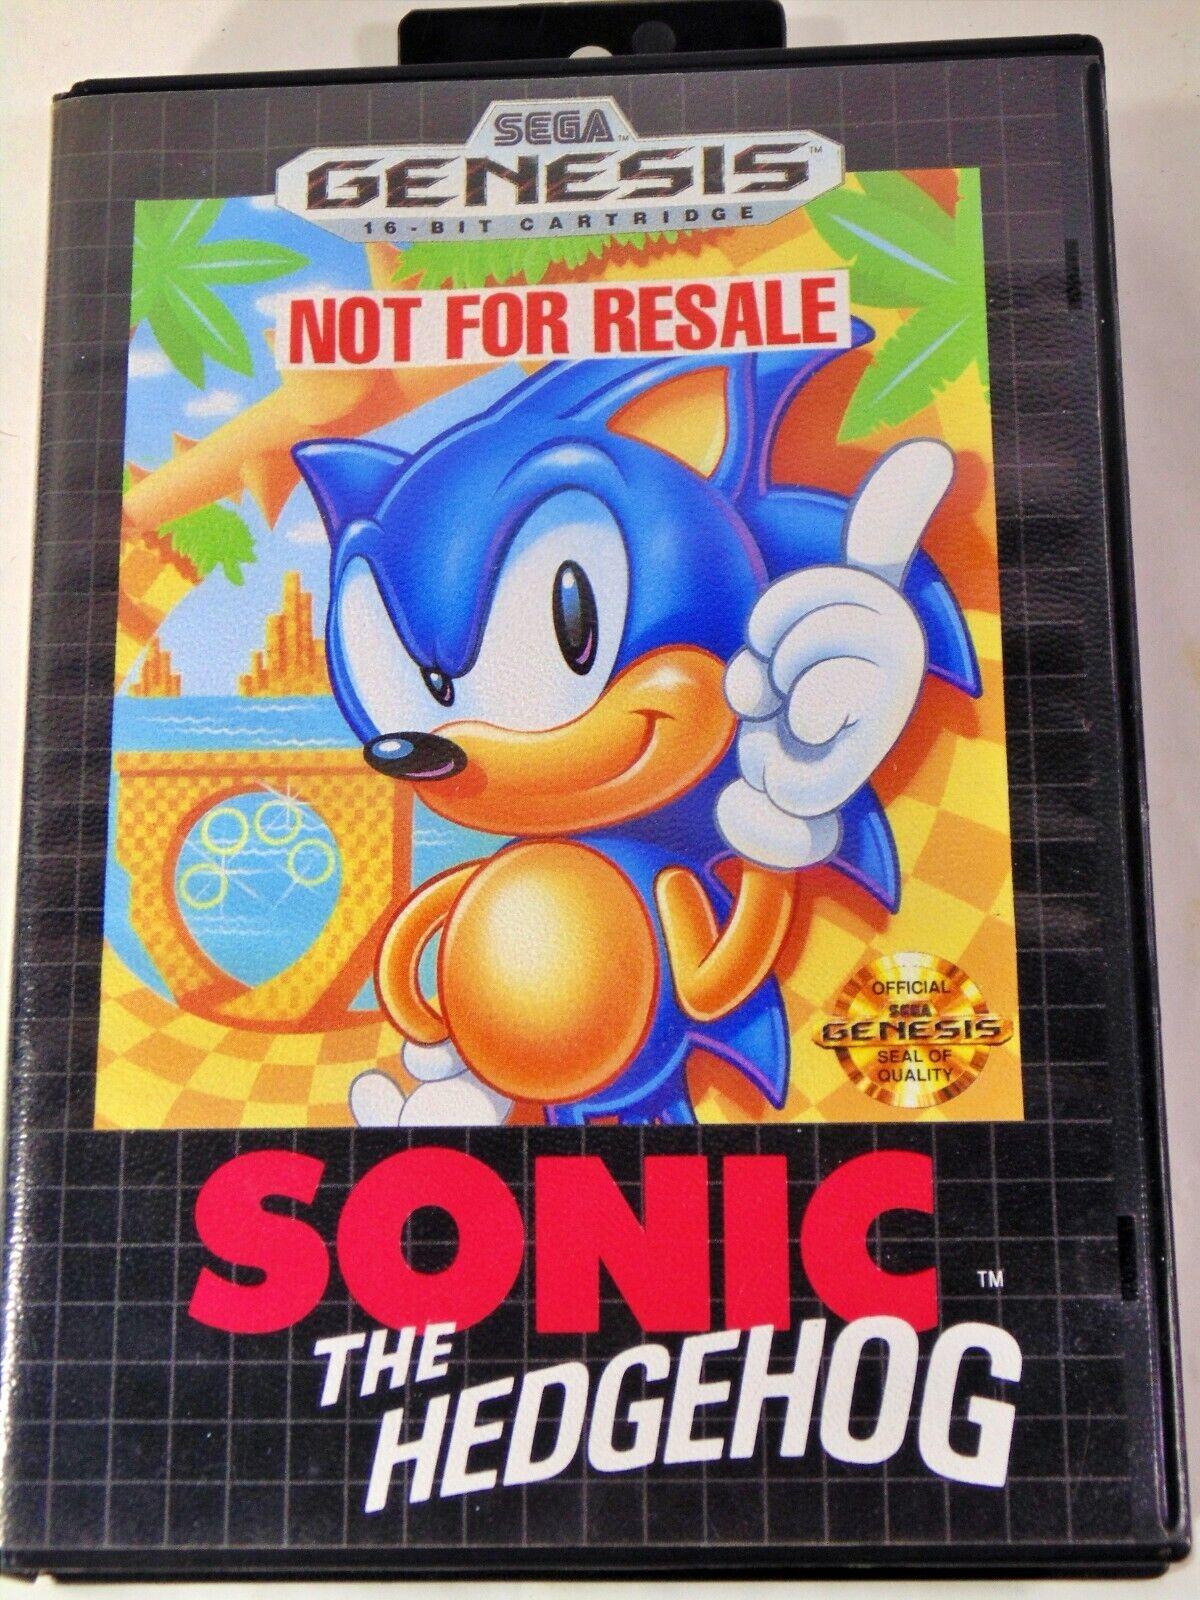 Sonic The Hedgehog Sega Genesis 1991 For Sale Online Ebay